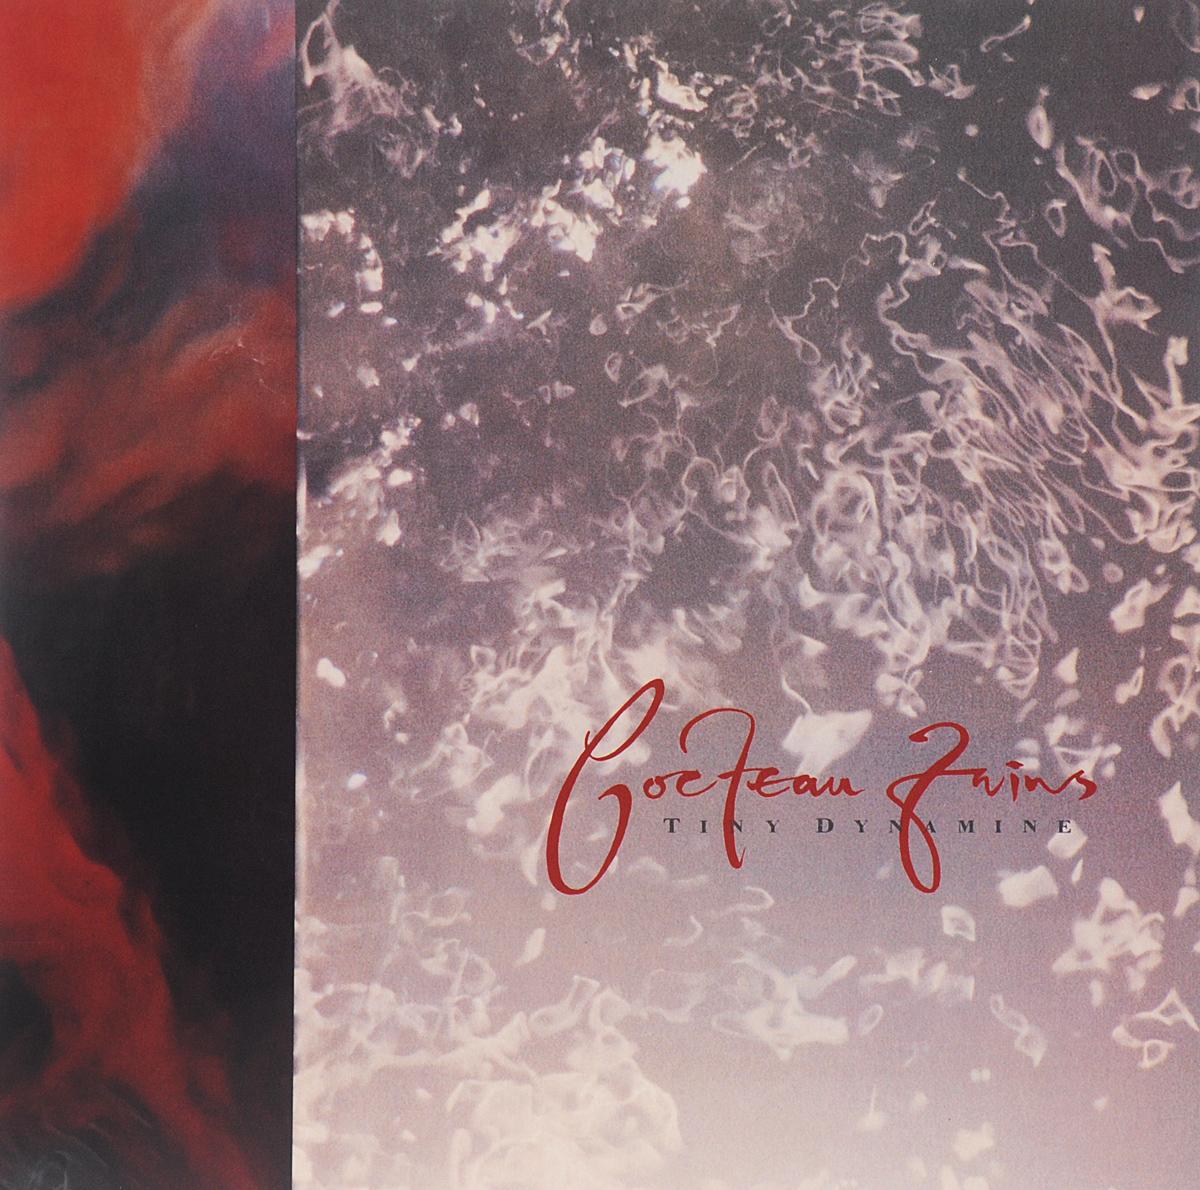 Cocteau Twins Cocteau Twins. Tiny Dynamine / Echoes In A Shallow Bay (LP) комплект постельного белья hobby home collection евро ранфорс almeda персиковое